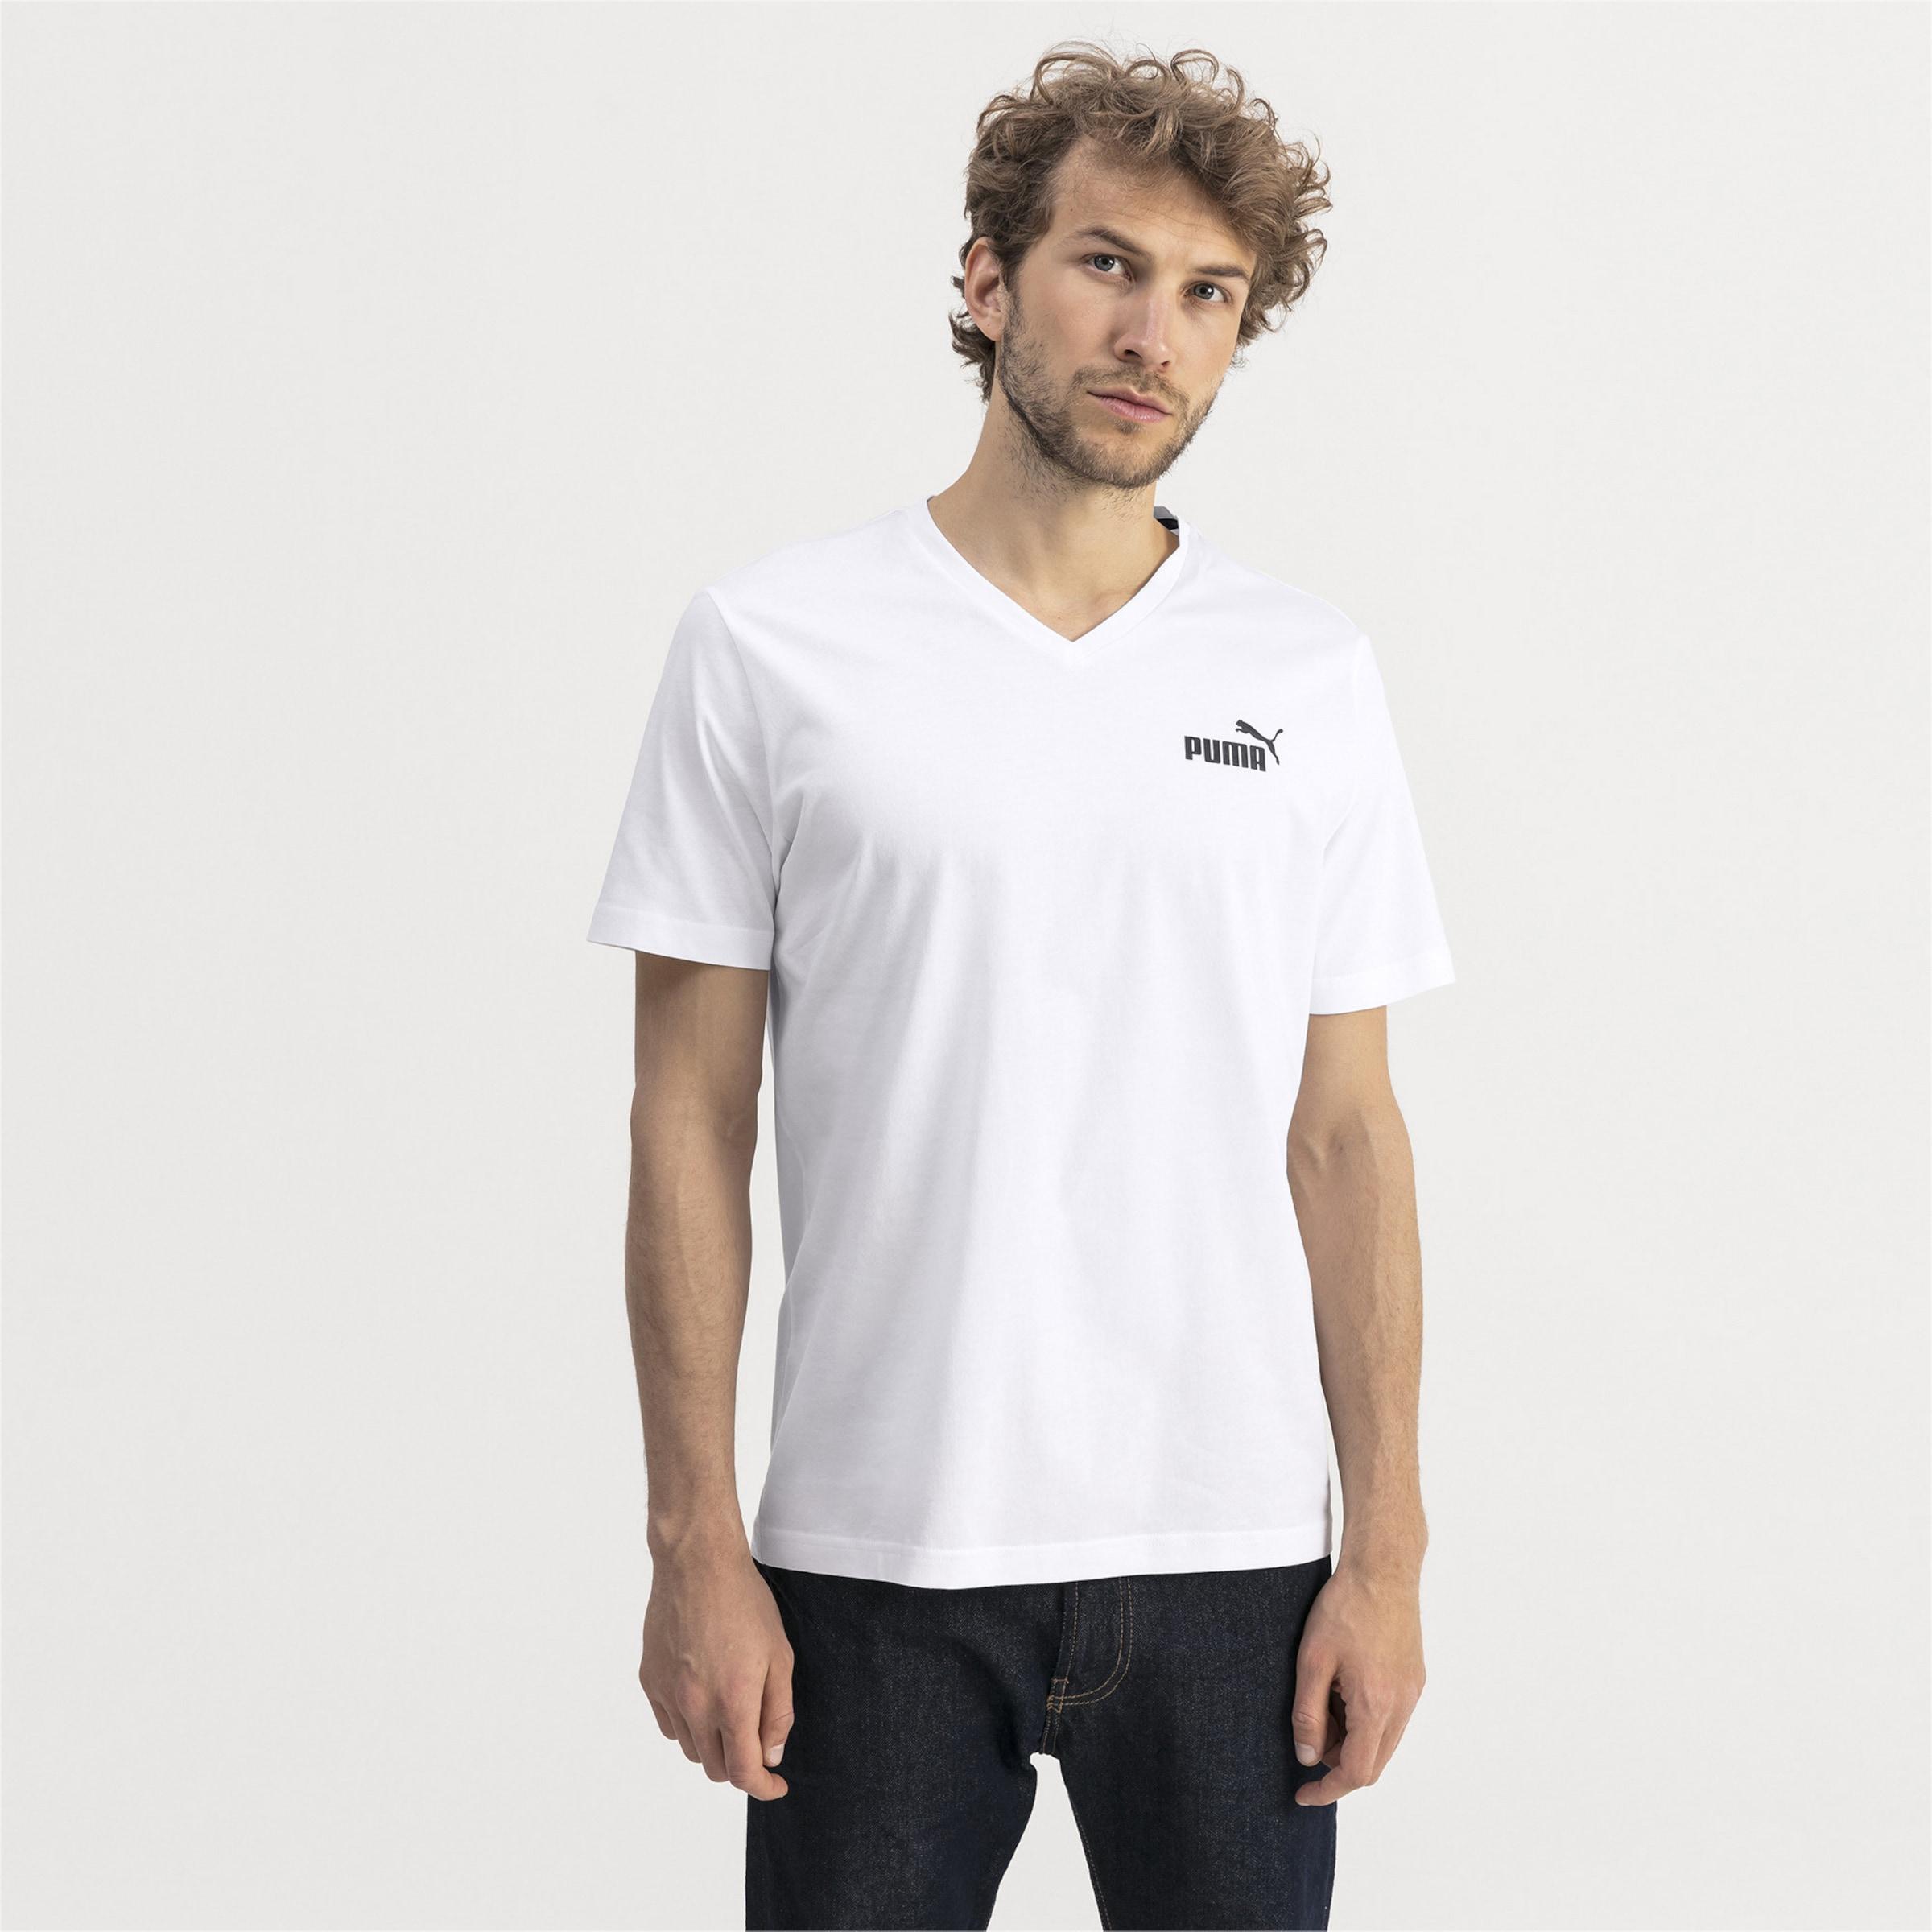 'essentials' shirt Puma T SchwarzWeiß In iZTOkXPu